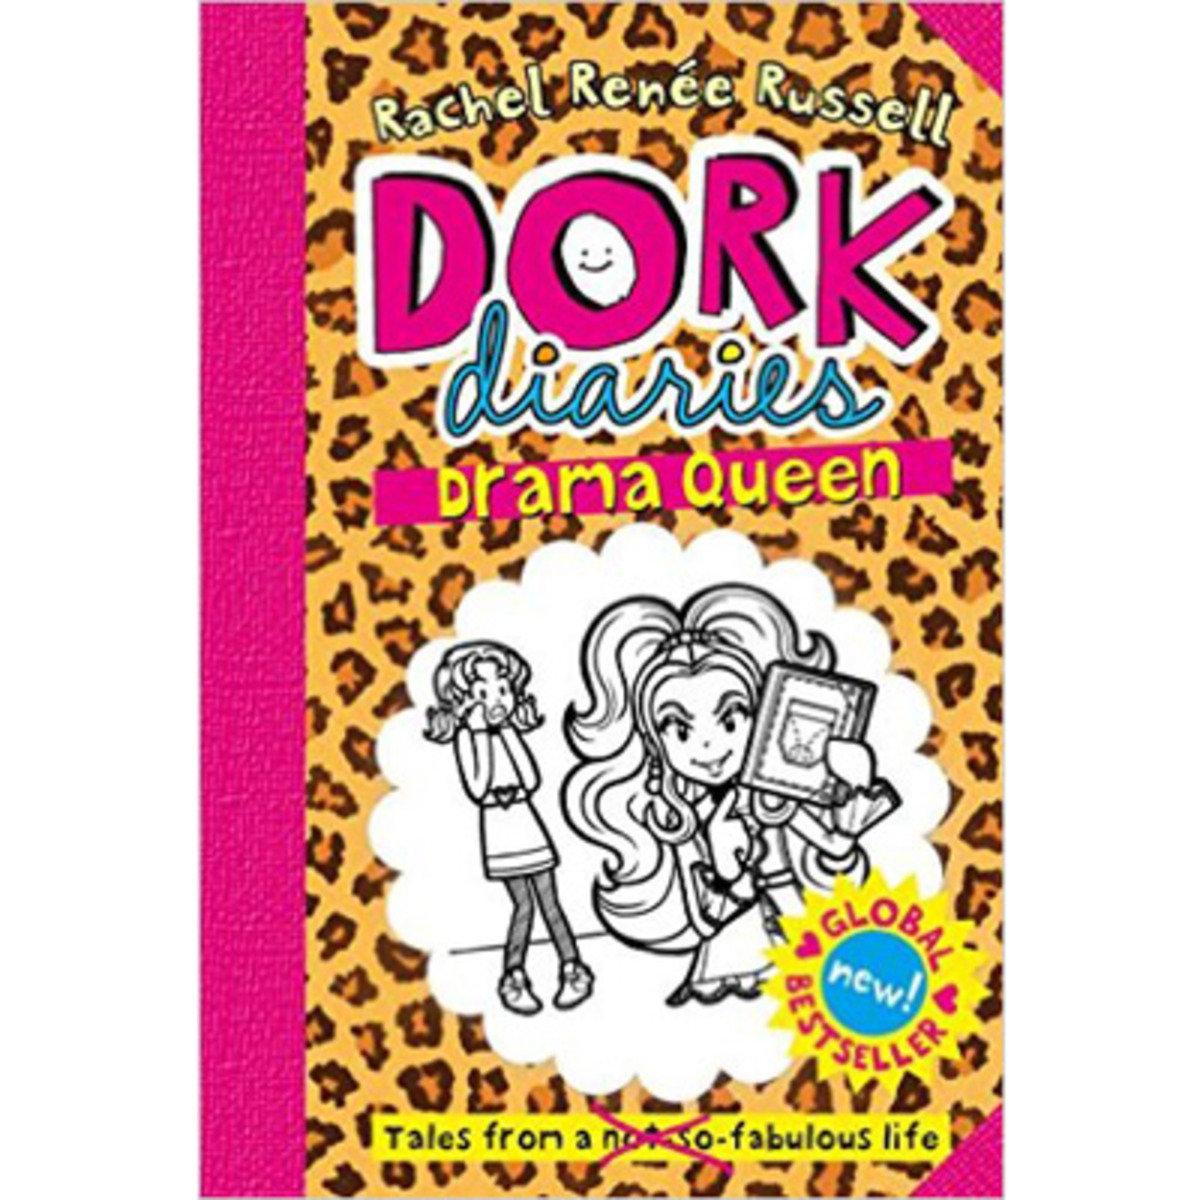 DORK DIARIES #9 DRAMA QUEEN 9781471117718